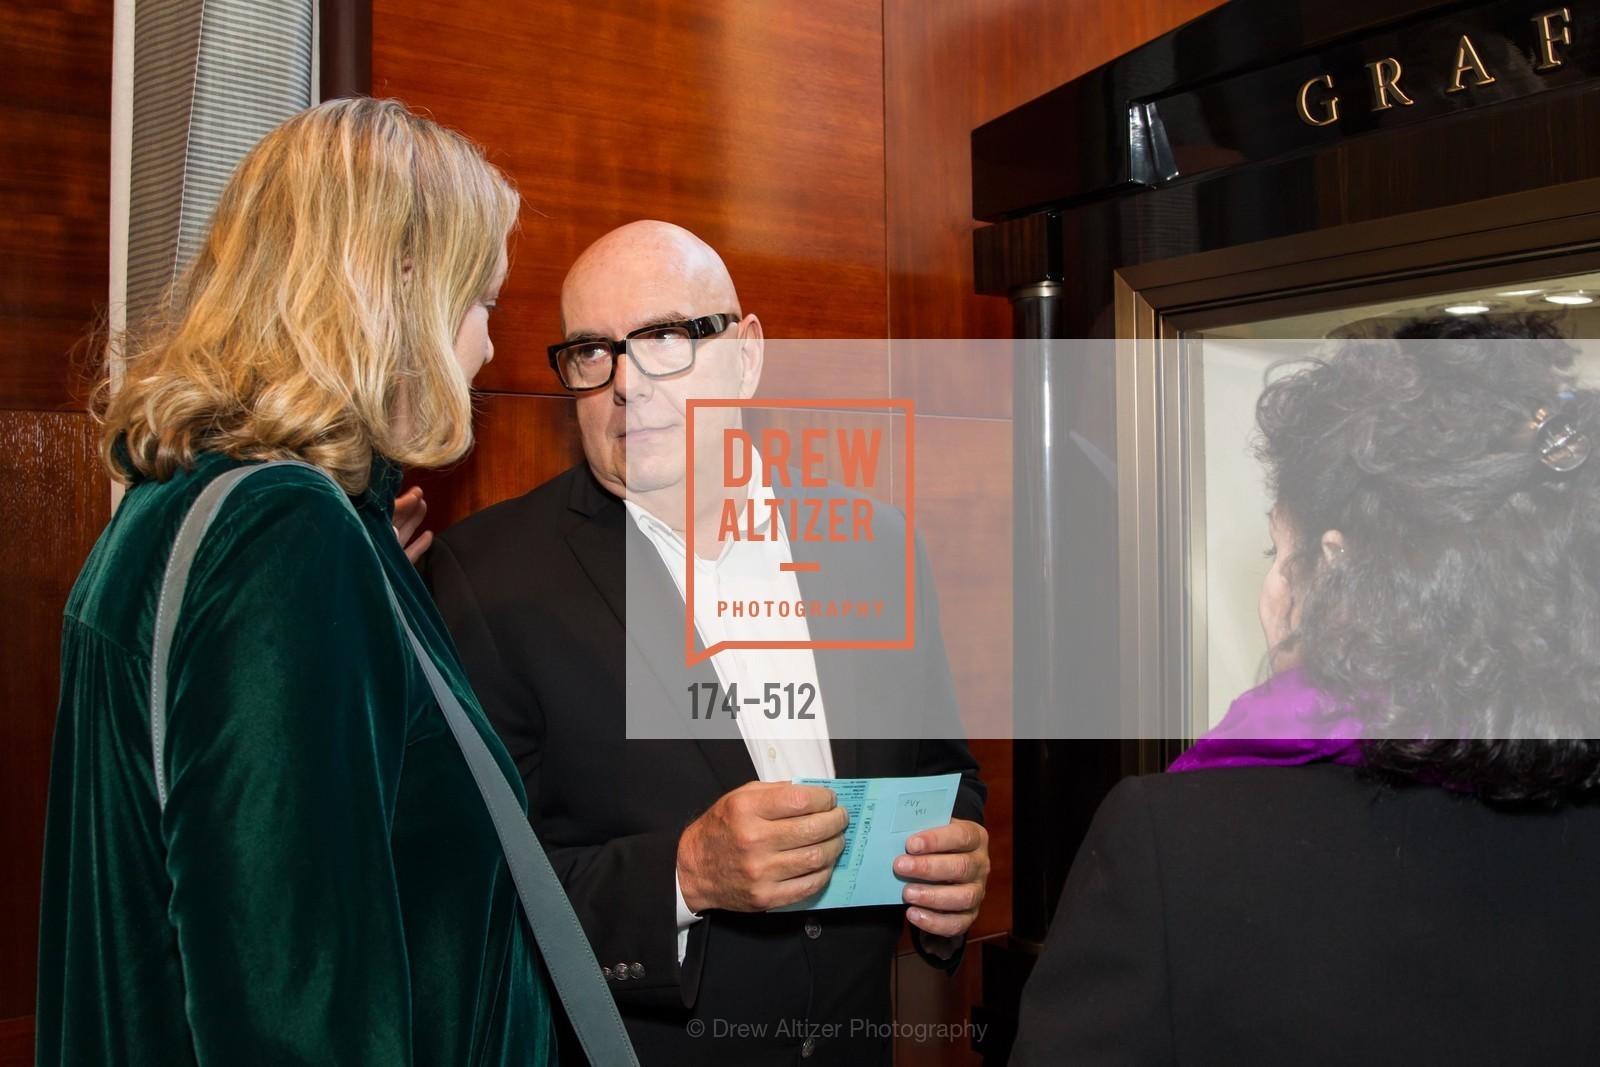 Robert Atkinson, GRAFF Celebrates SMUIN BALLET, US. 237 Post Street SF, April 9th, 2014,Drew Altizer, Drew Altizer Photography, full-service agency, private events, San Francisco photographer, photographer california